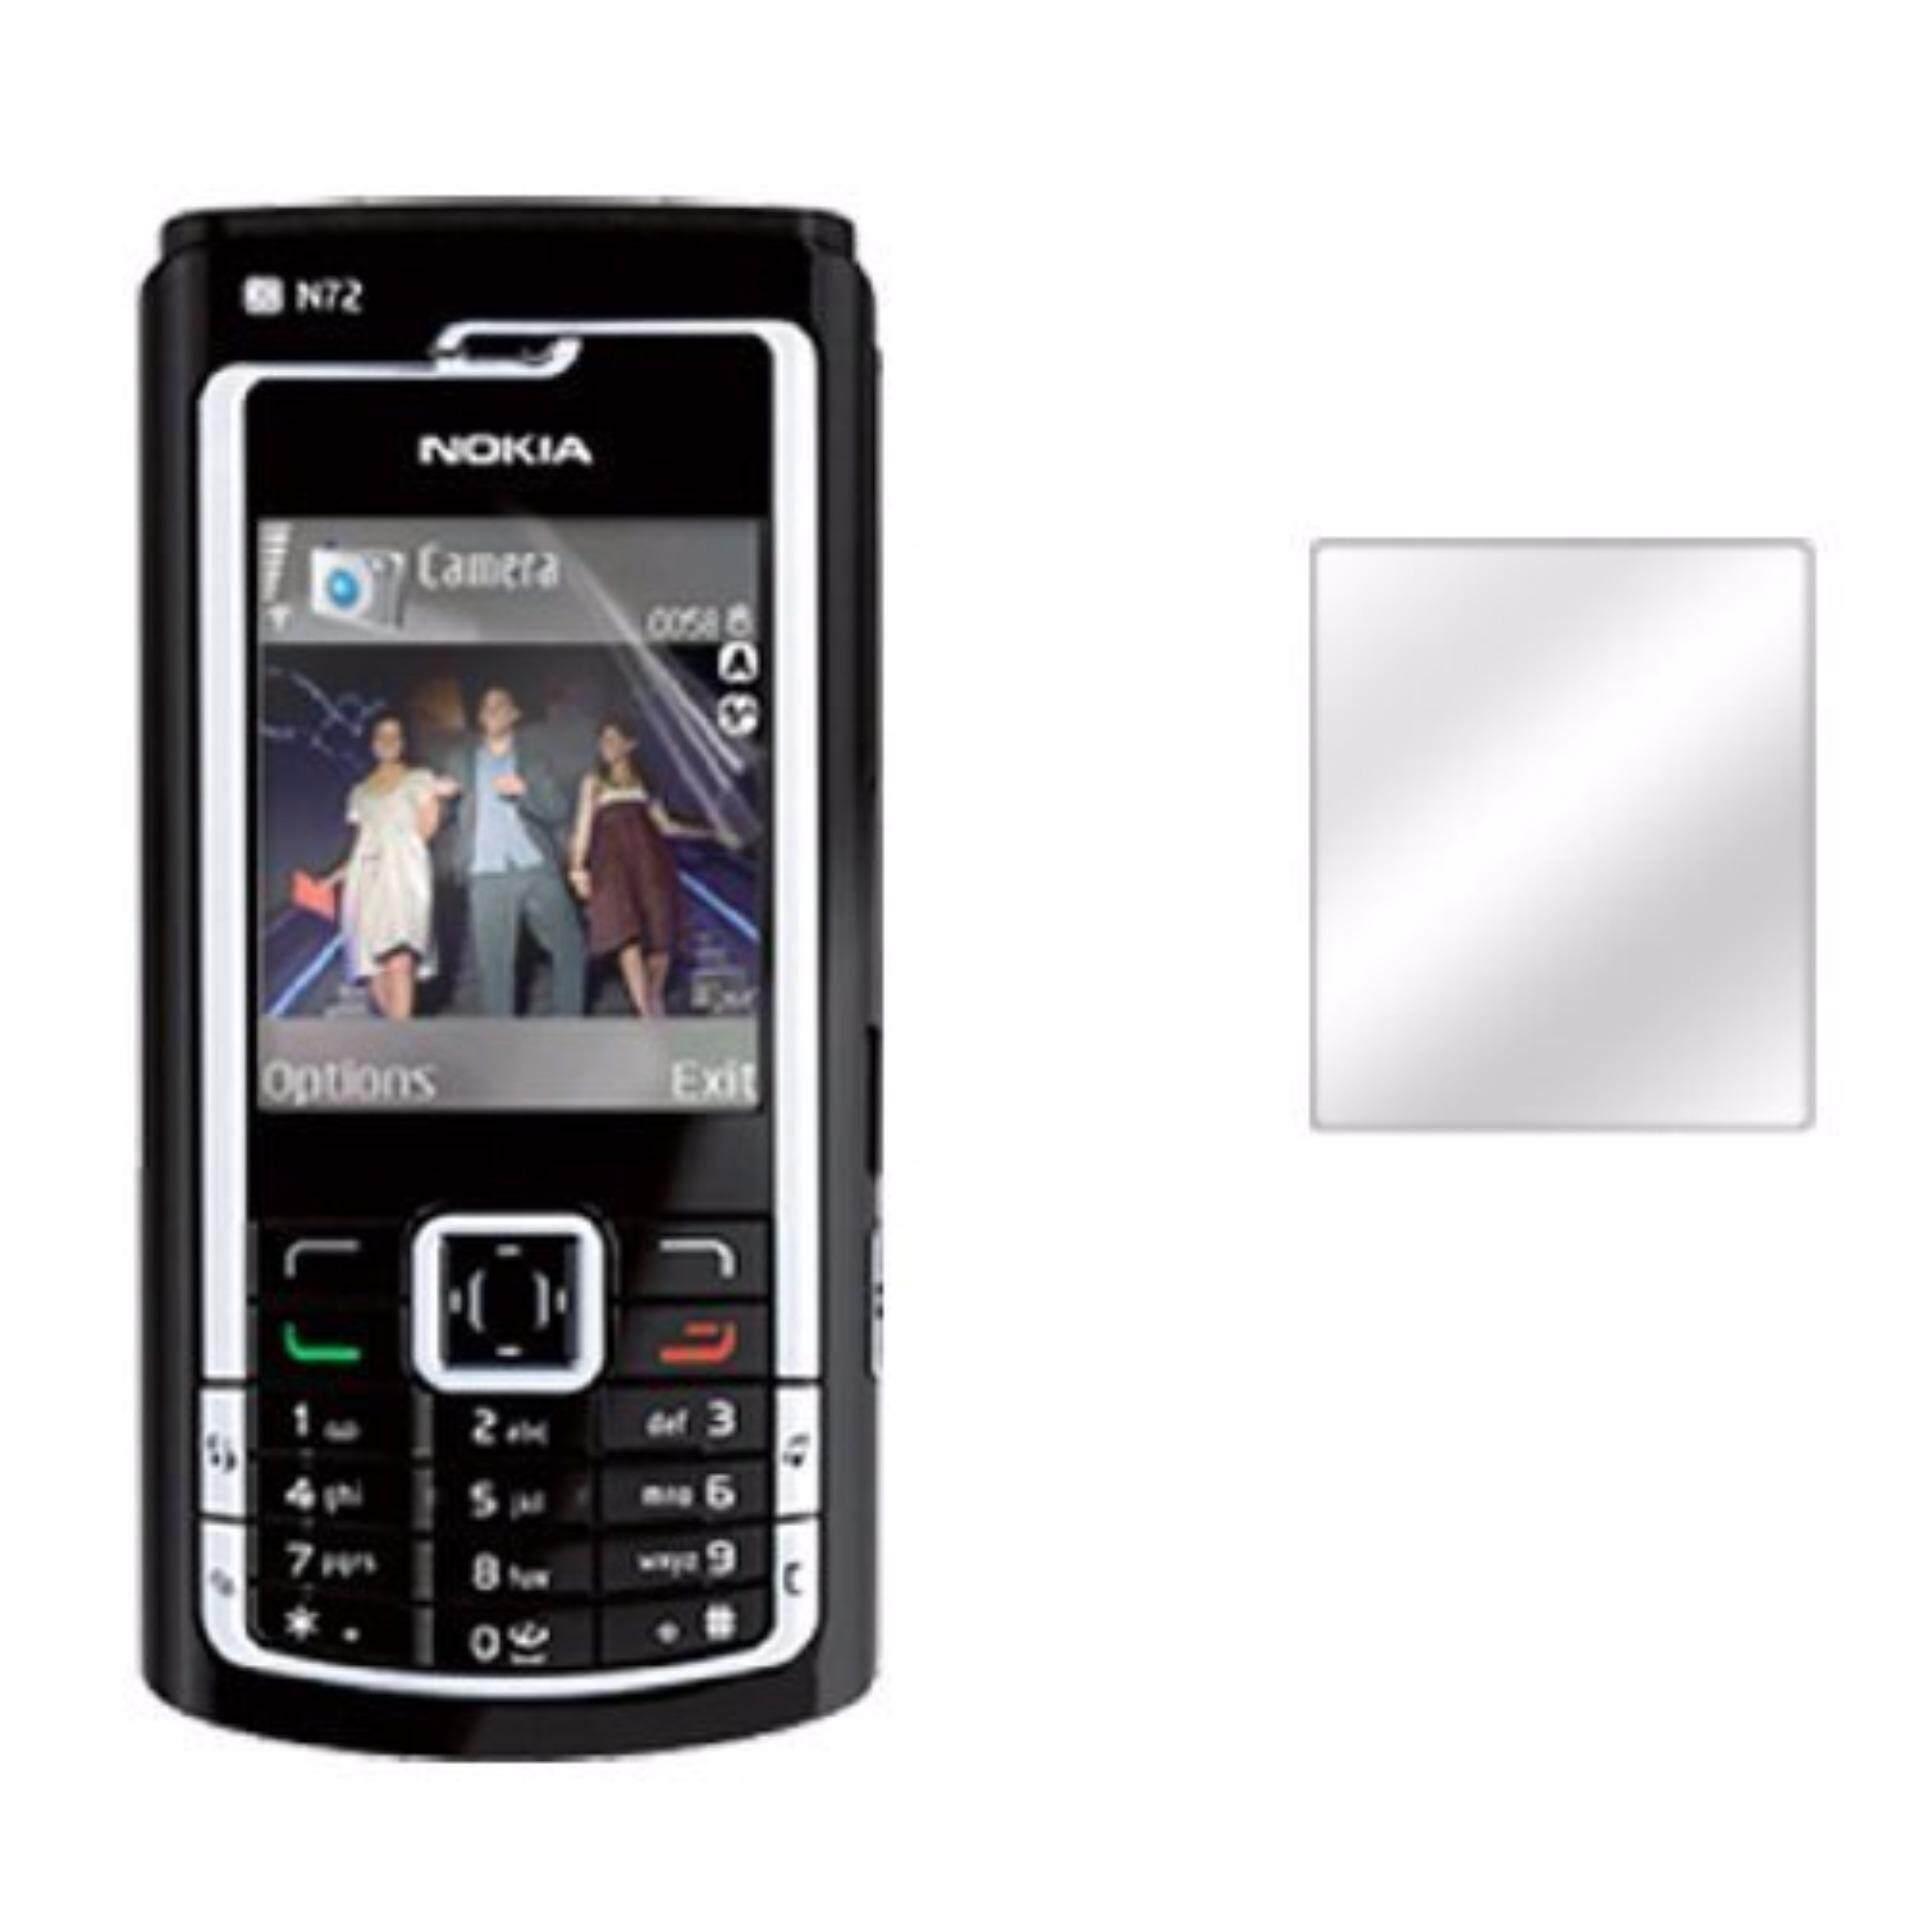 Nokia N72 Clear Screen Protector